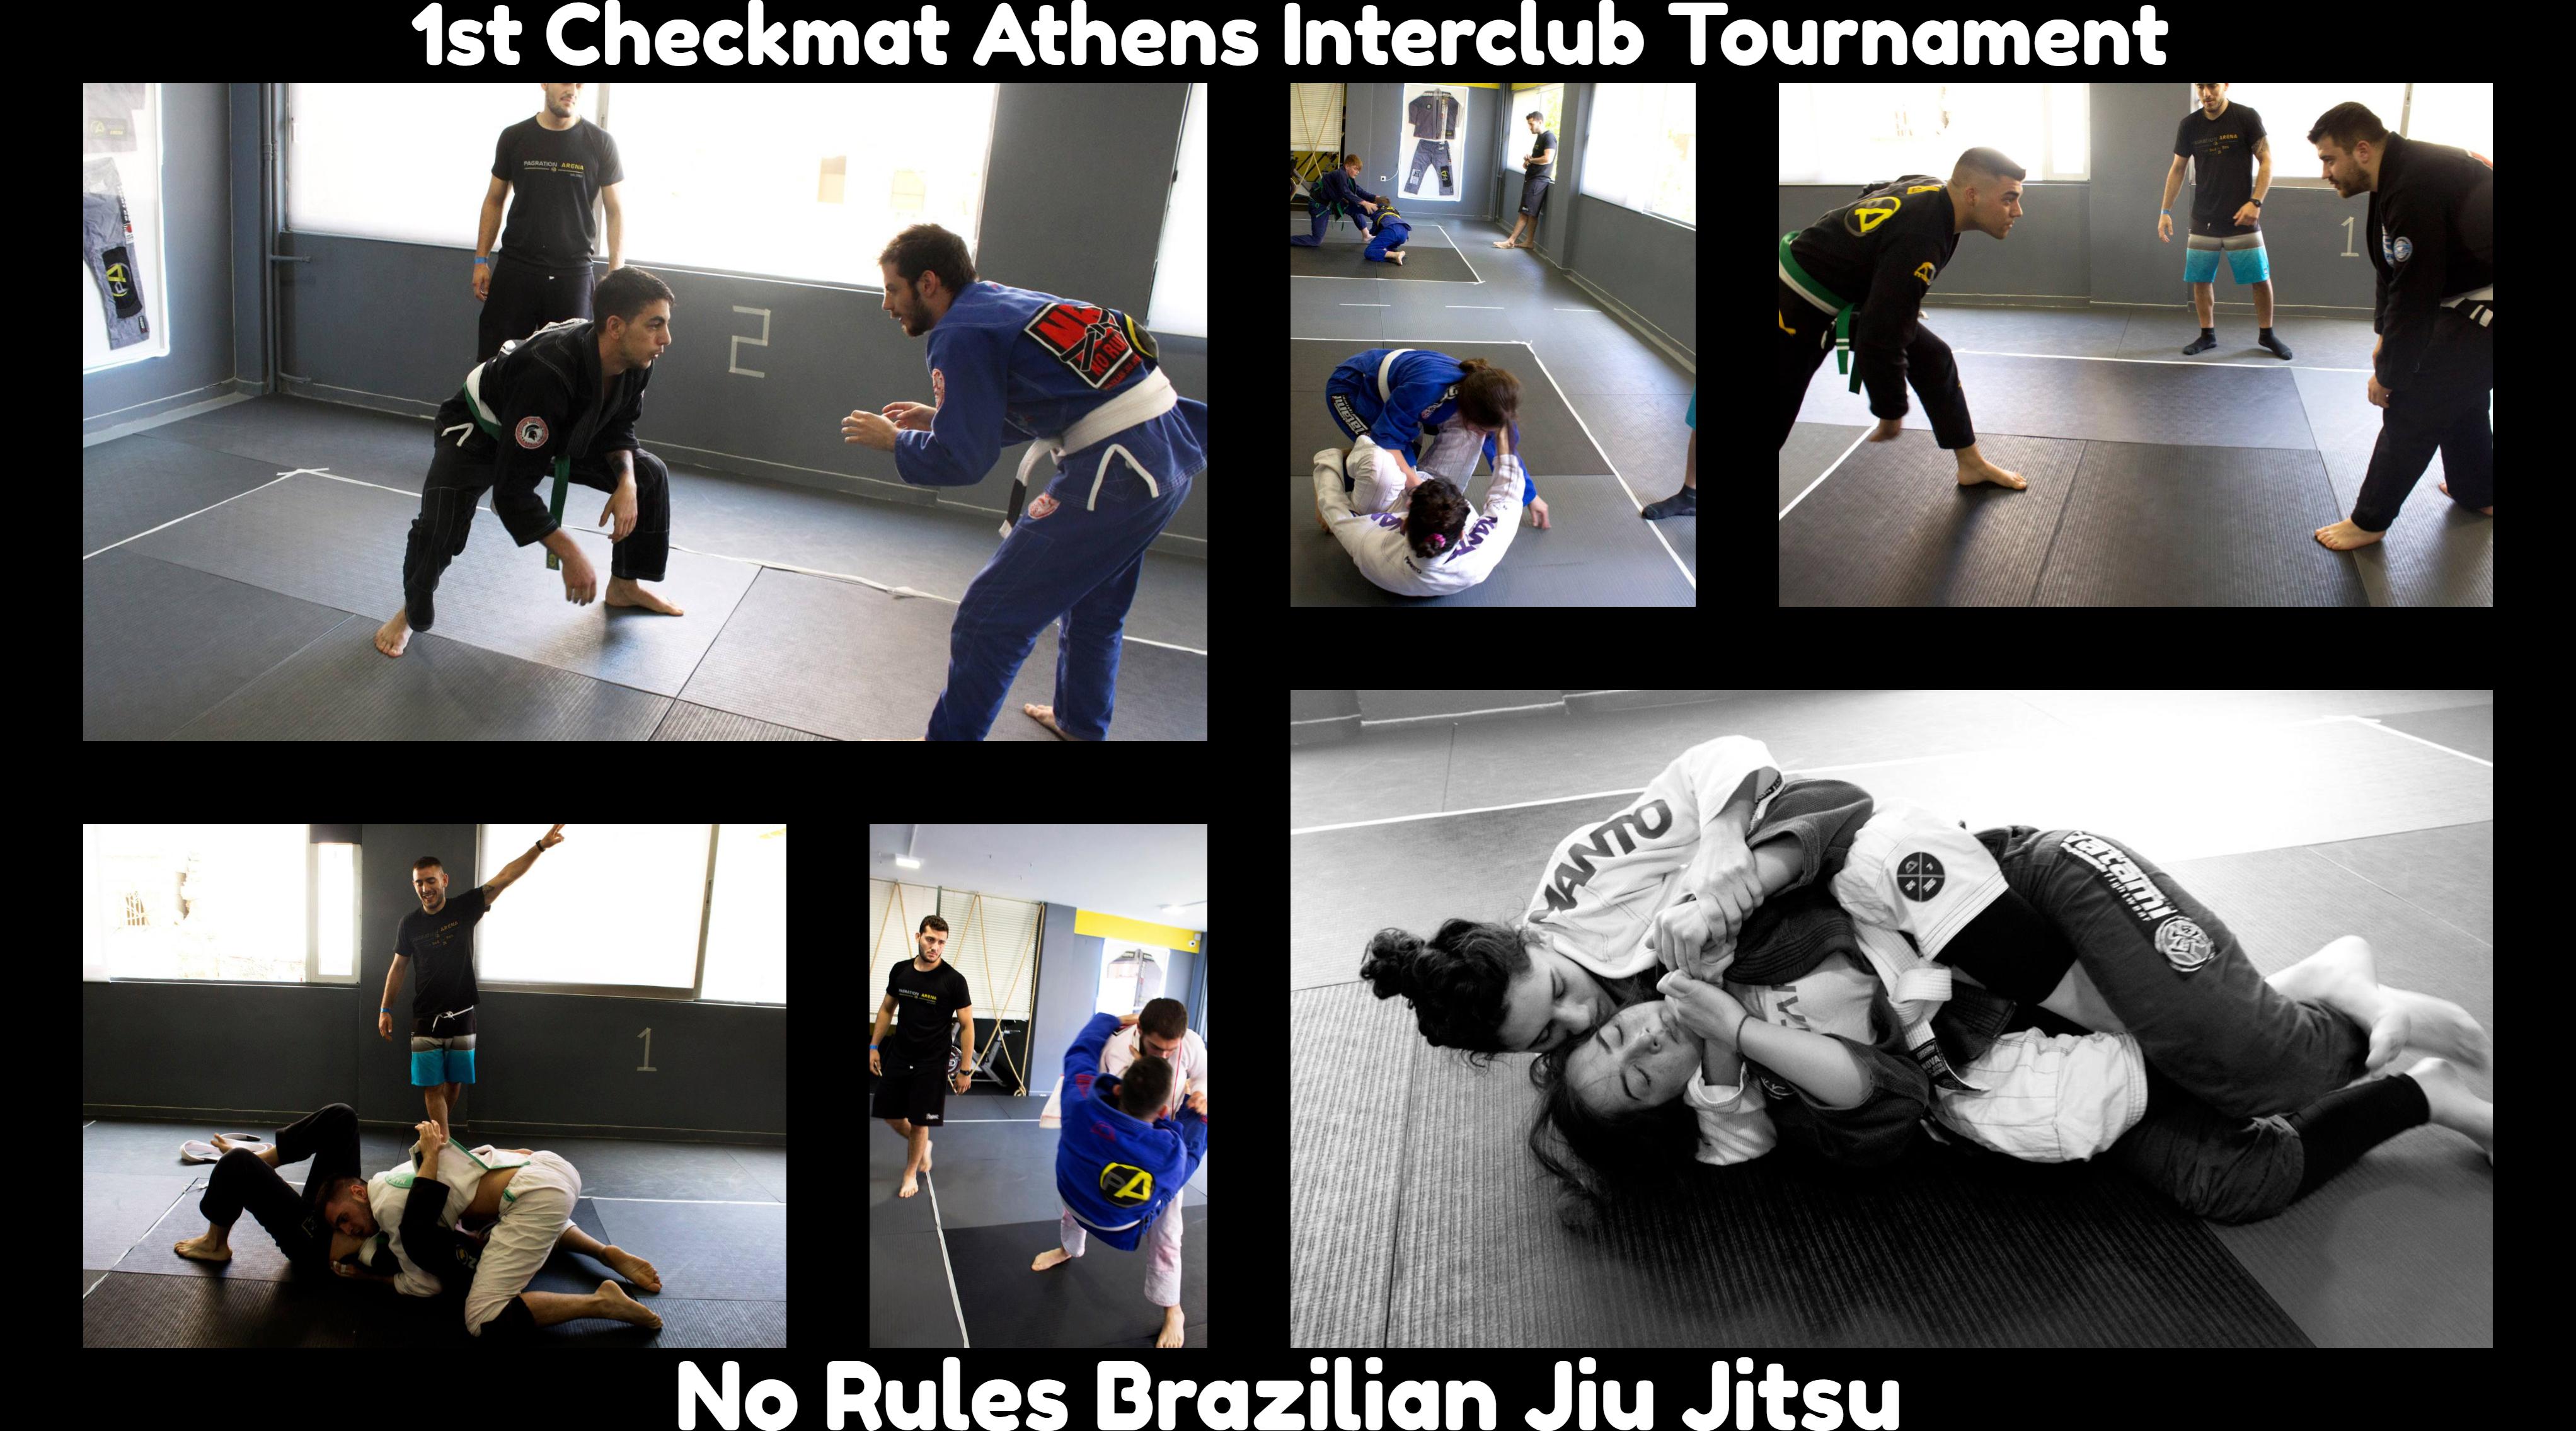 No Rules Brazilian Jiu Jitsu  1st Checkmat Athens Interclub Tournament 3a80e16e64c